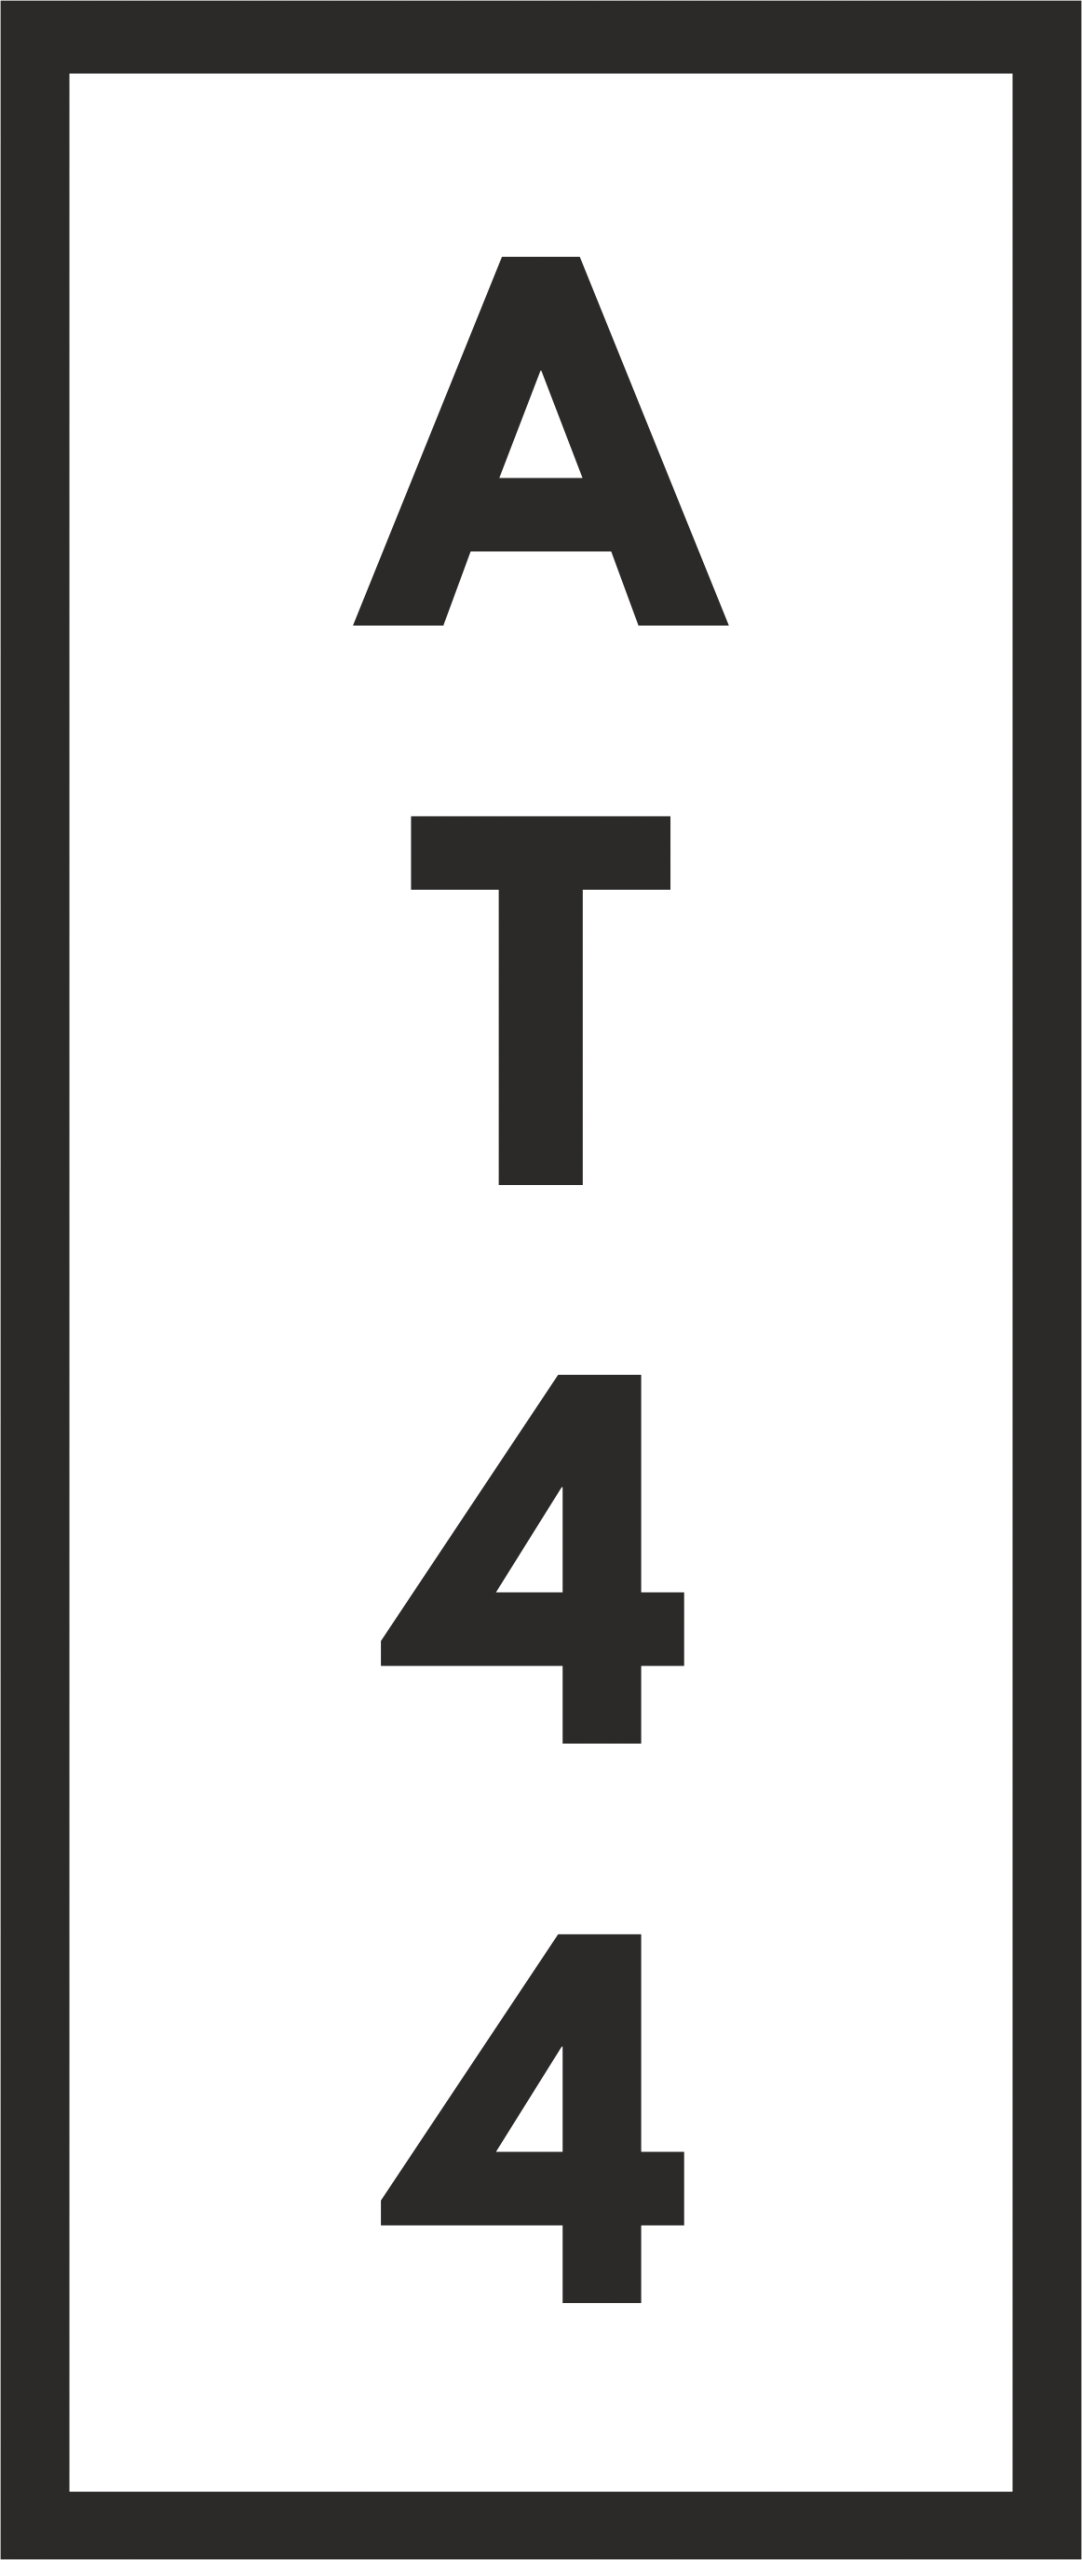 AT 44